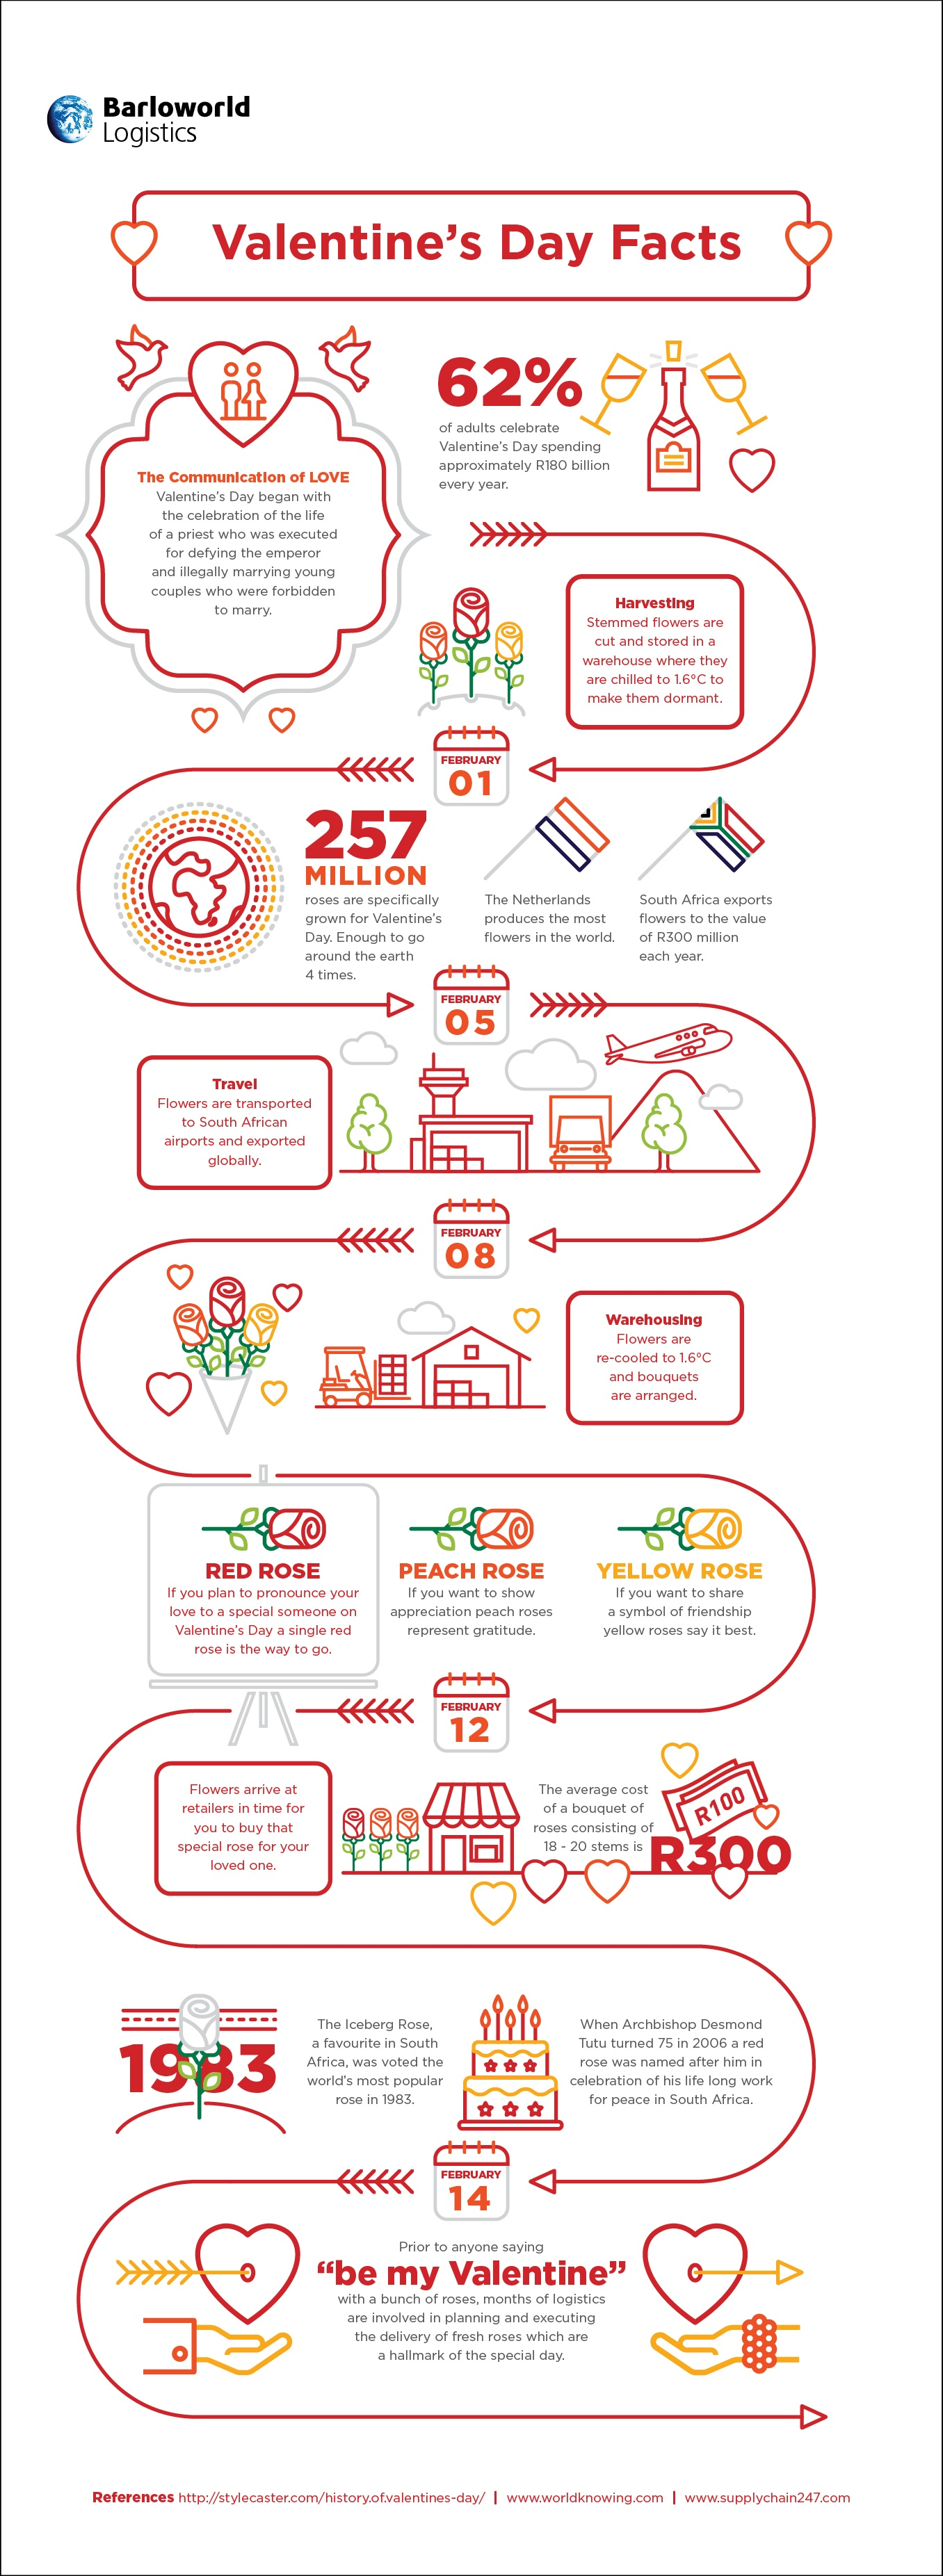 Logistics of life Infographic - Valentine's Day